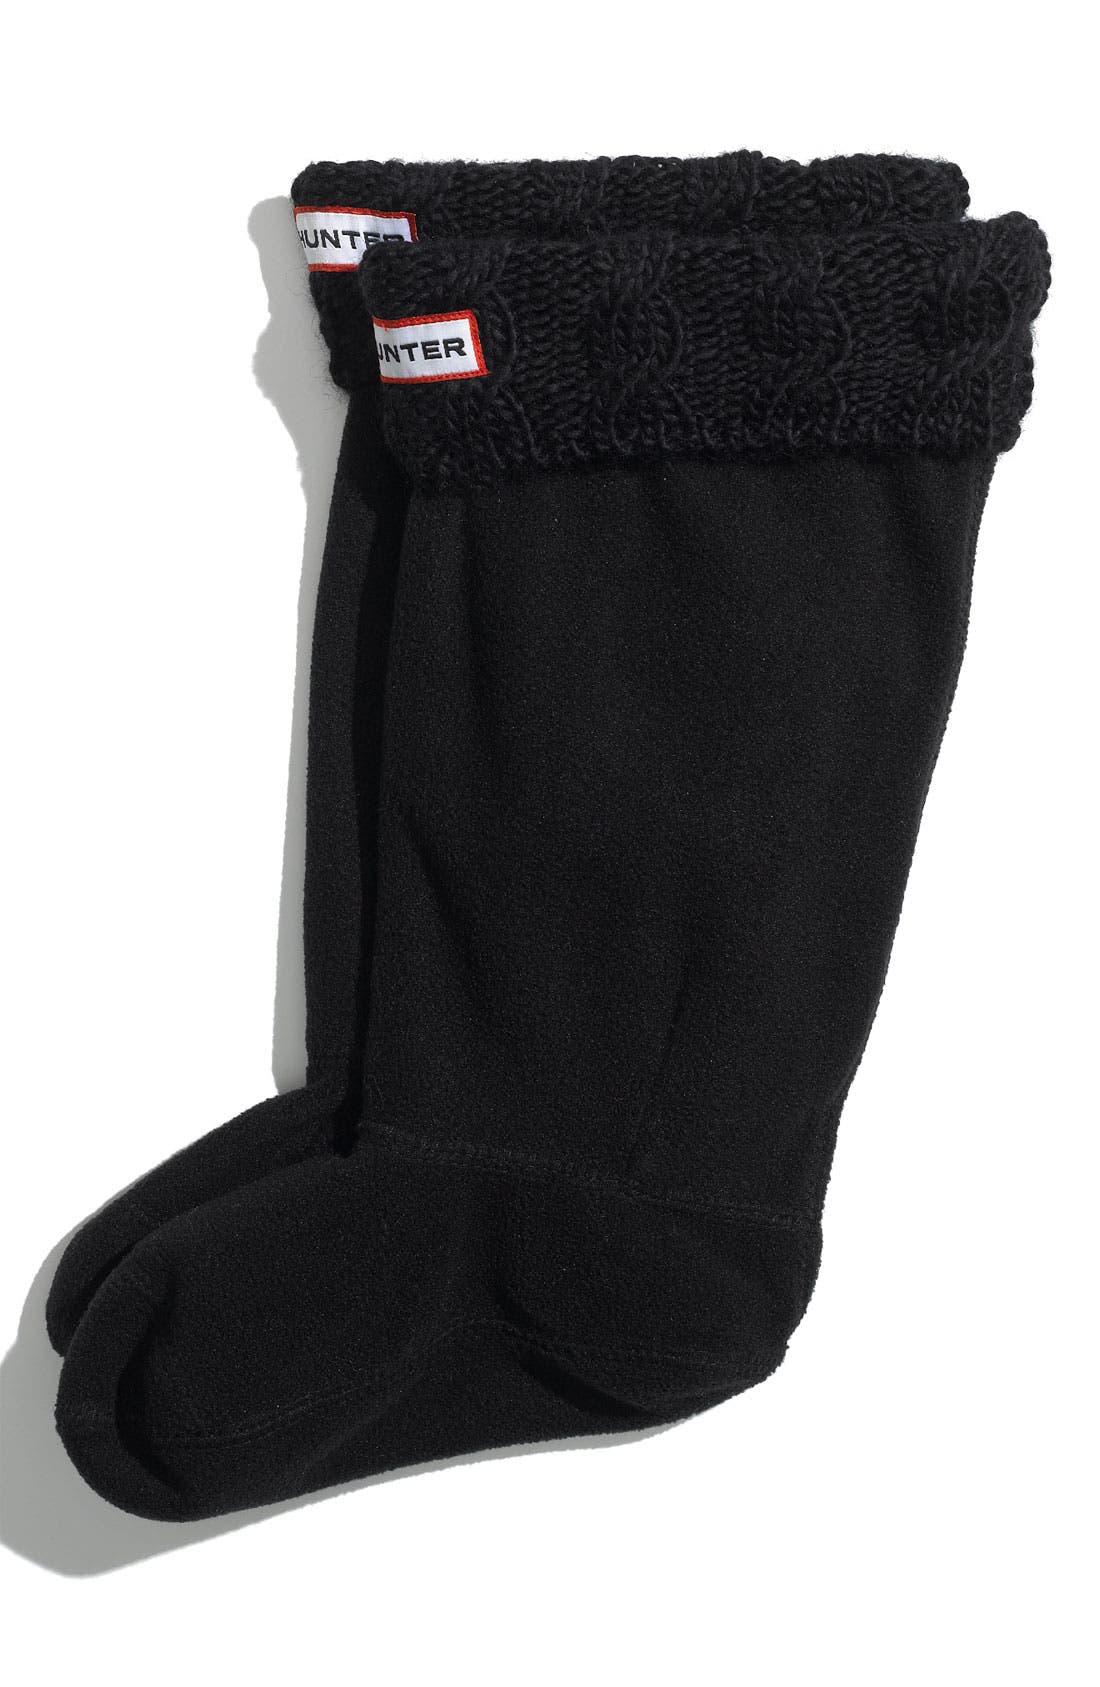 Alternate Image 1 Selected - Hunter Cabled Cuff Welly Socks (Toddler Girls, Little Girls & Big Girls)